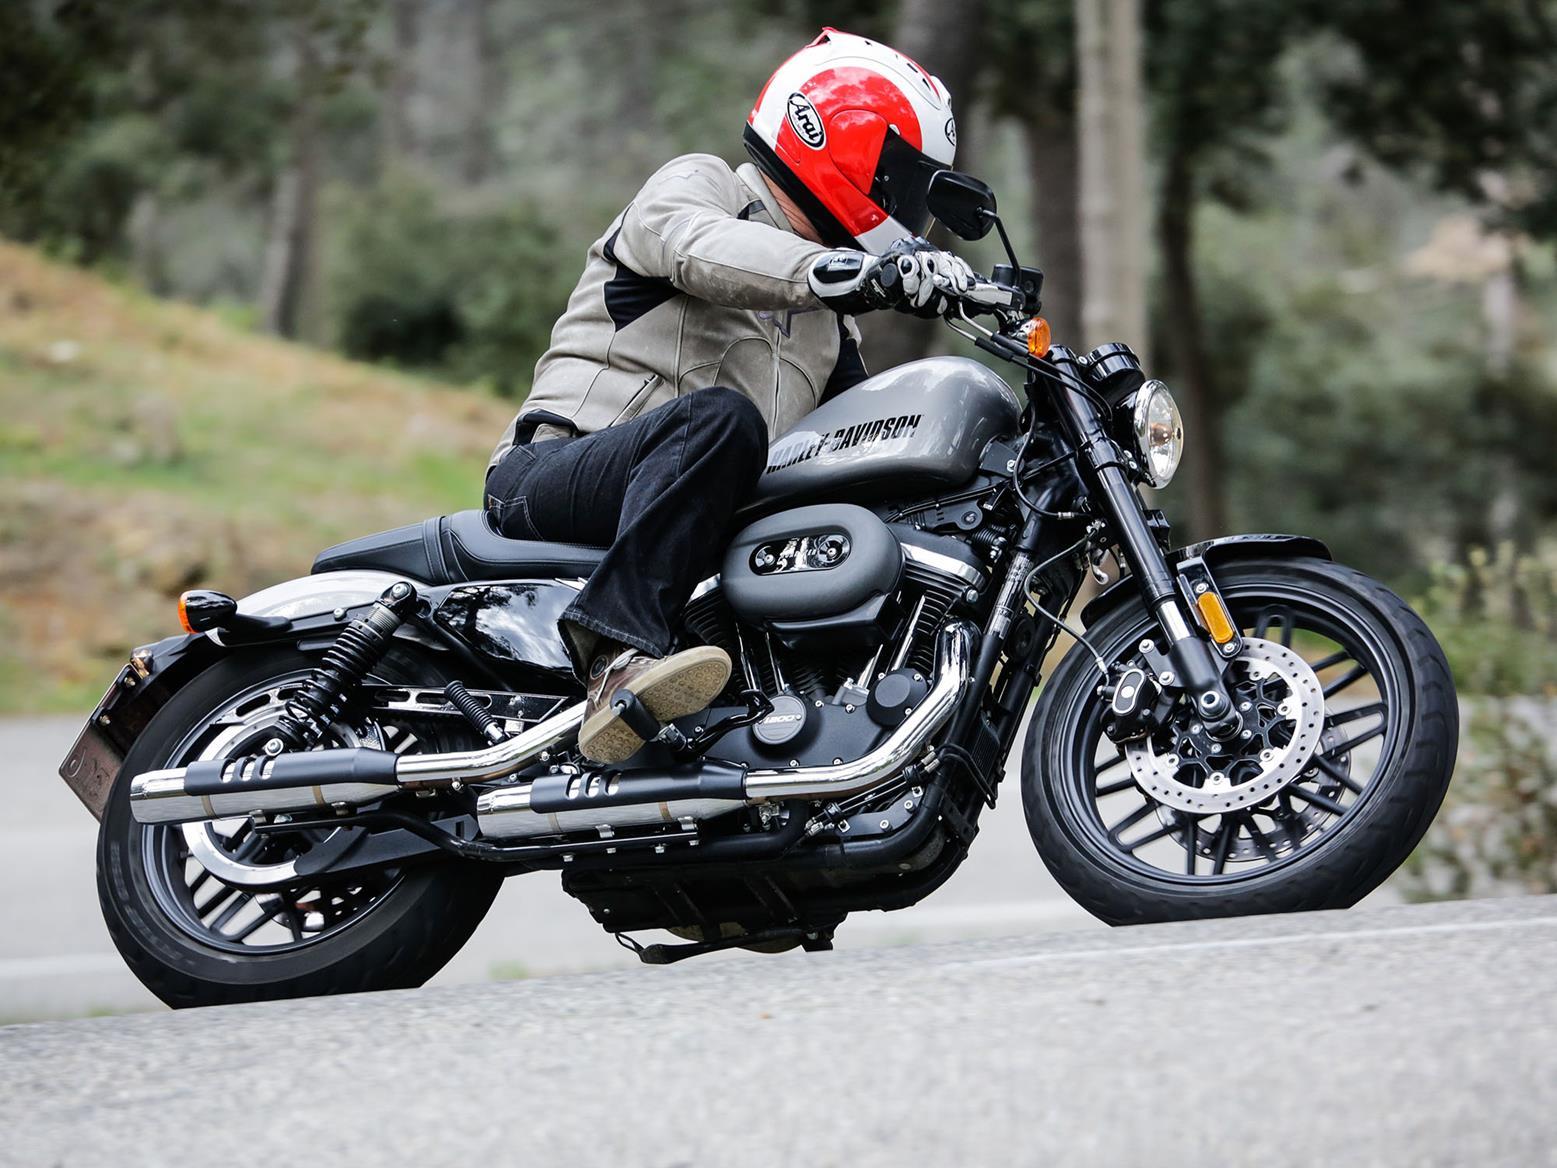 Harley-Davidson Roadster 1200 scraping a peg